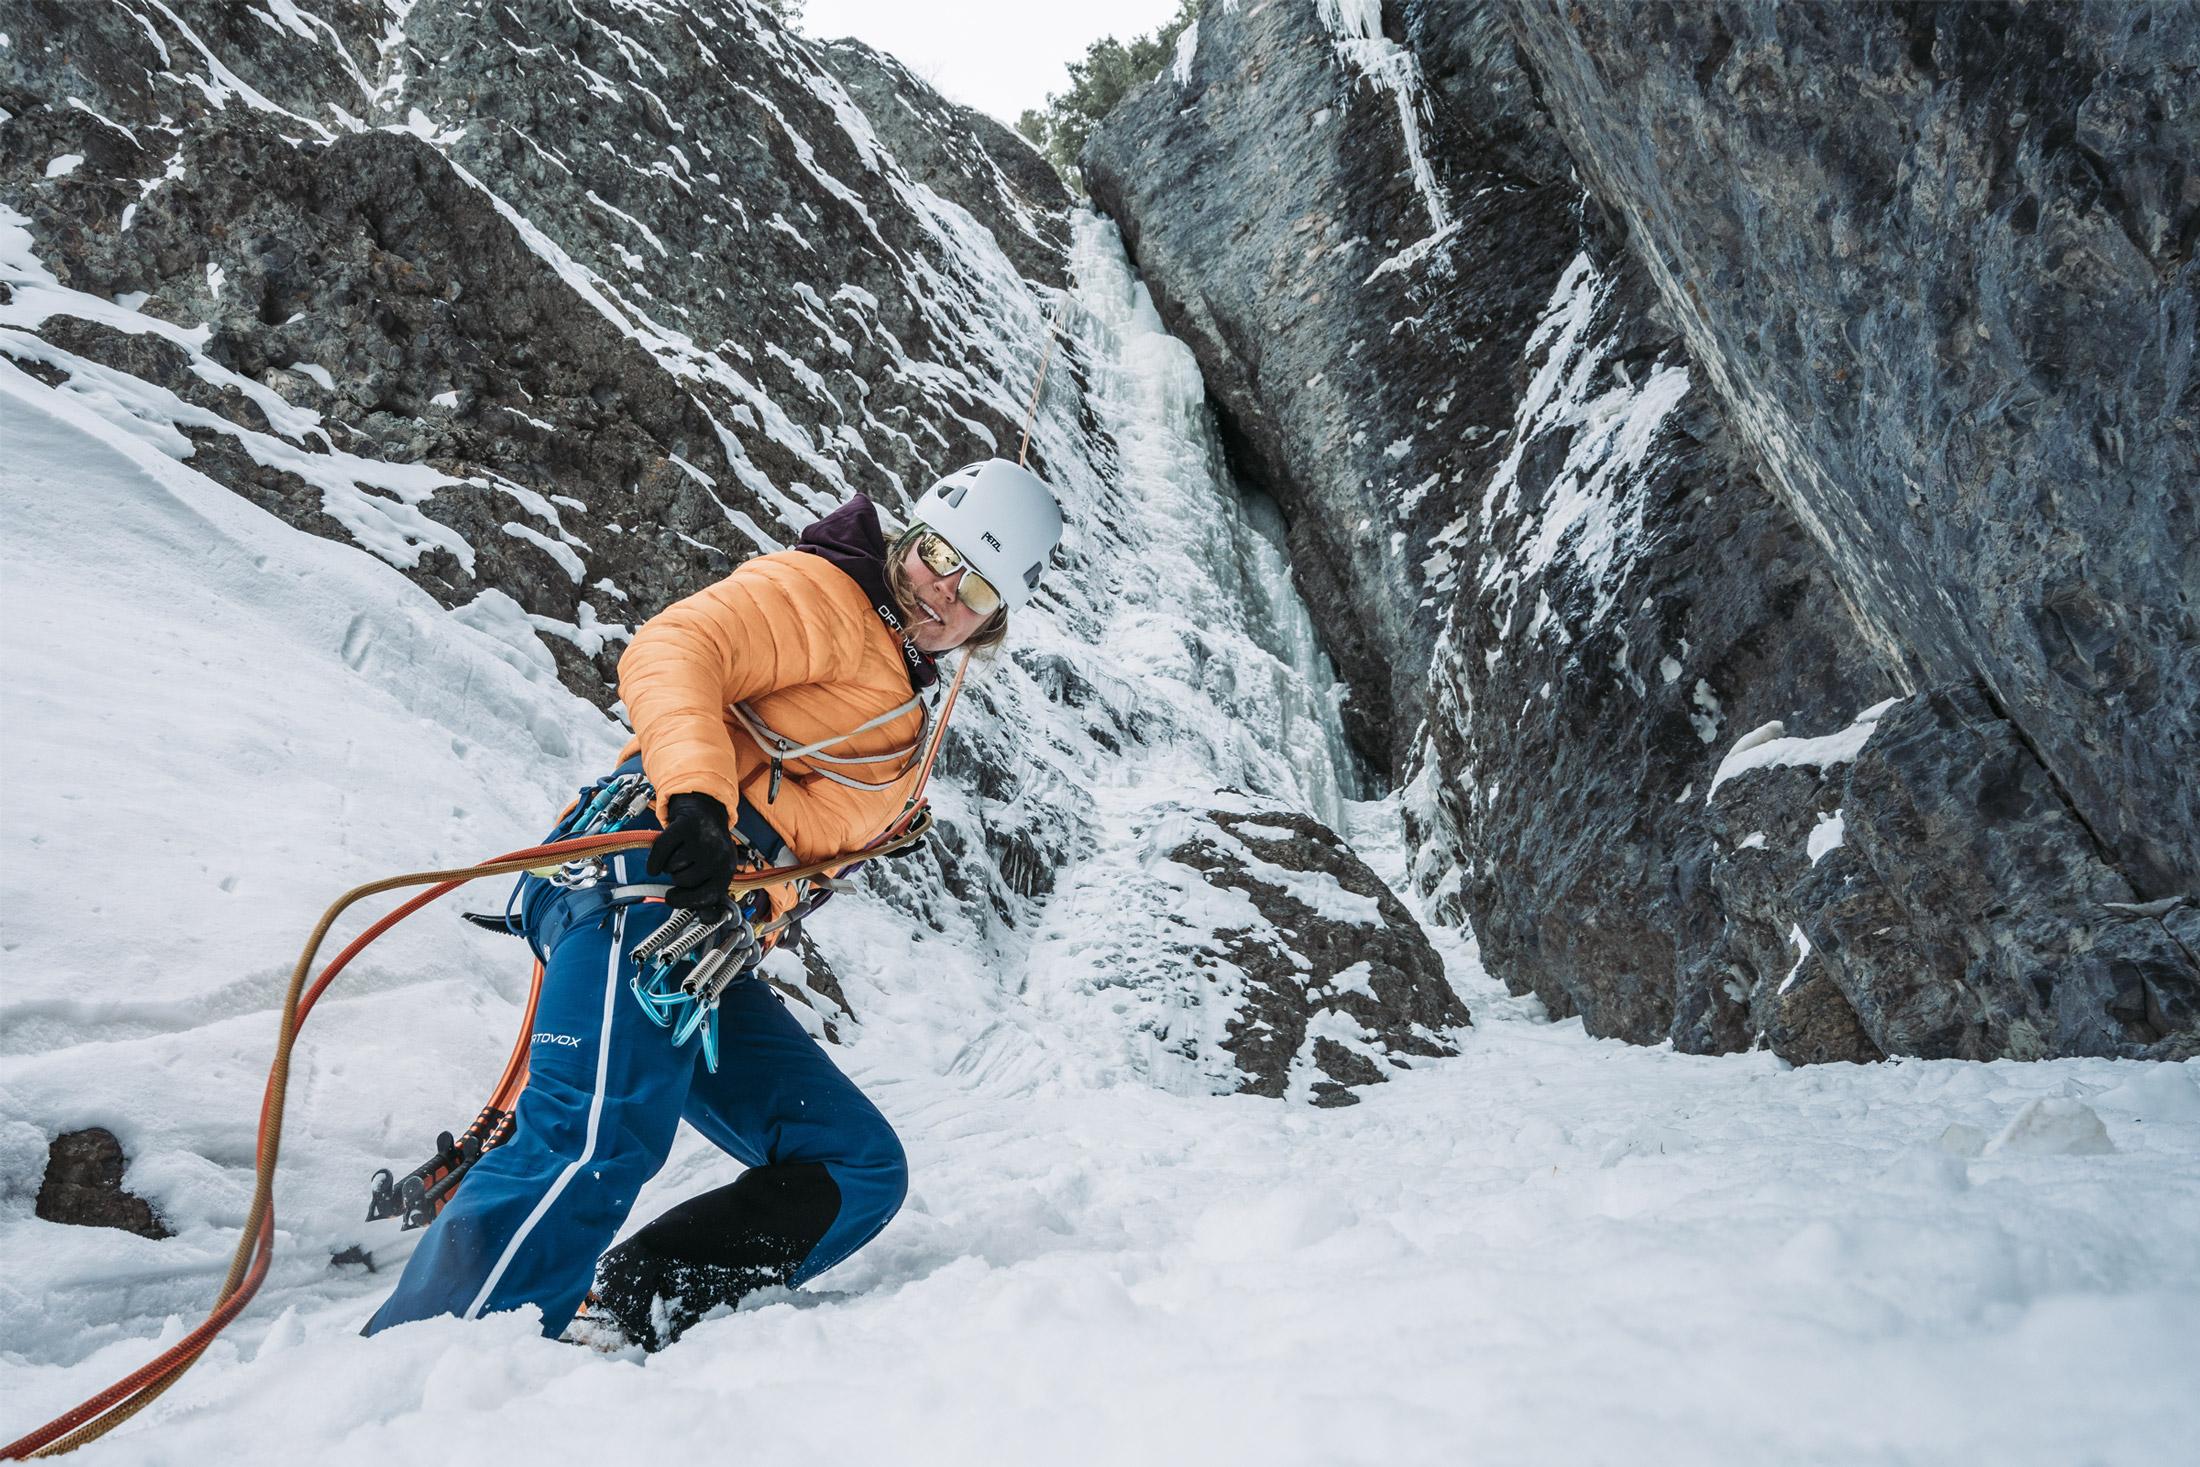 woman climbing while wearing winter jacket